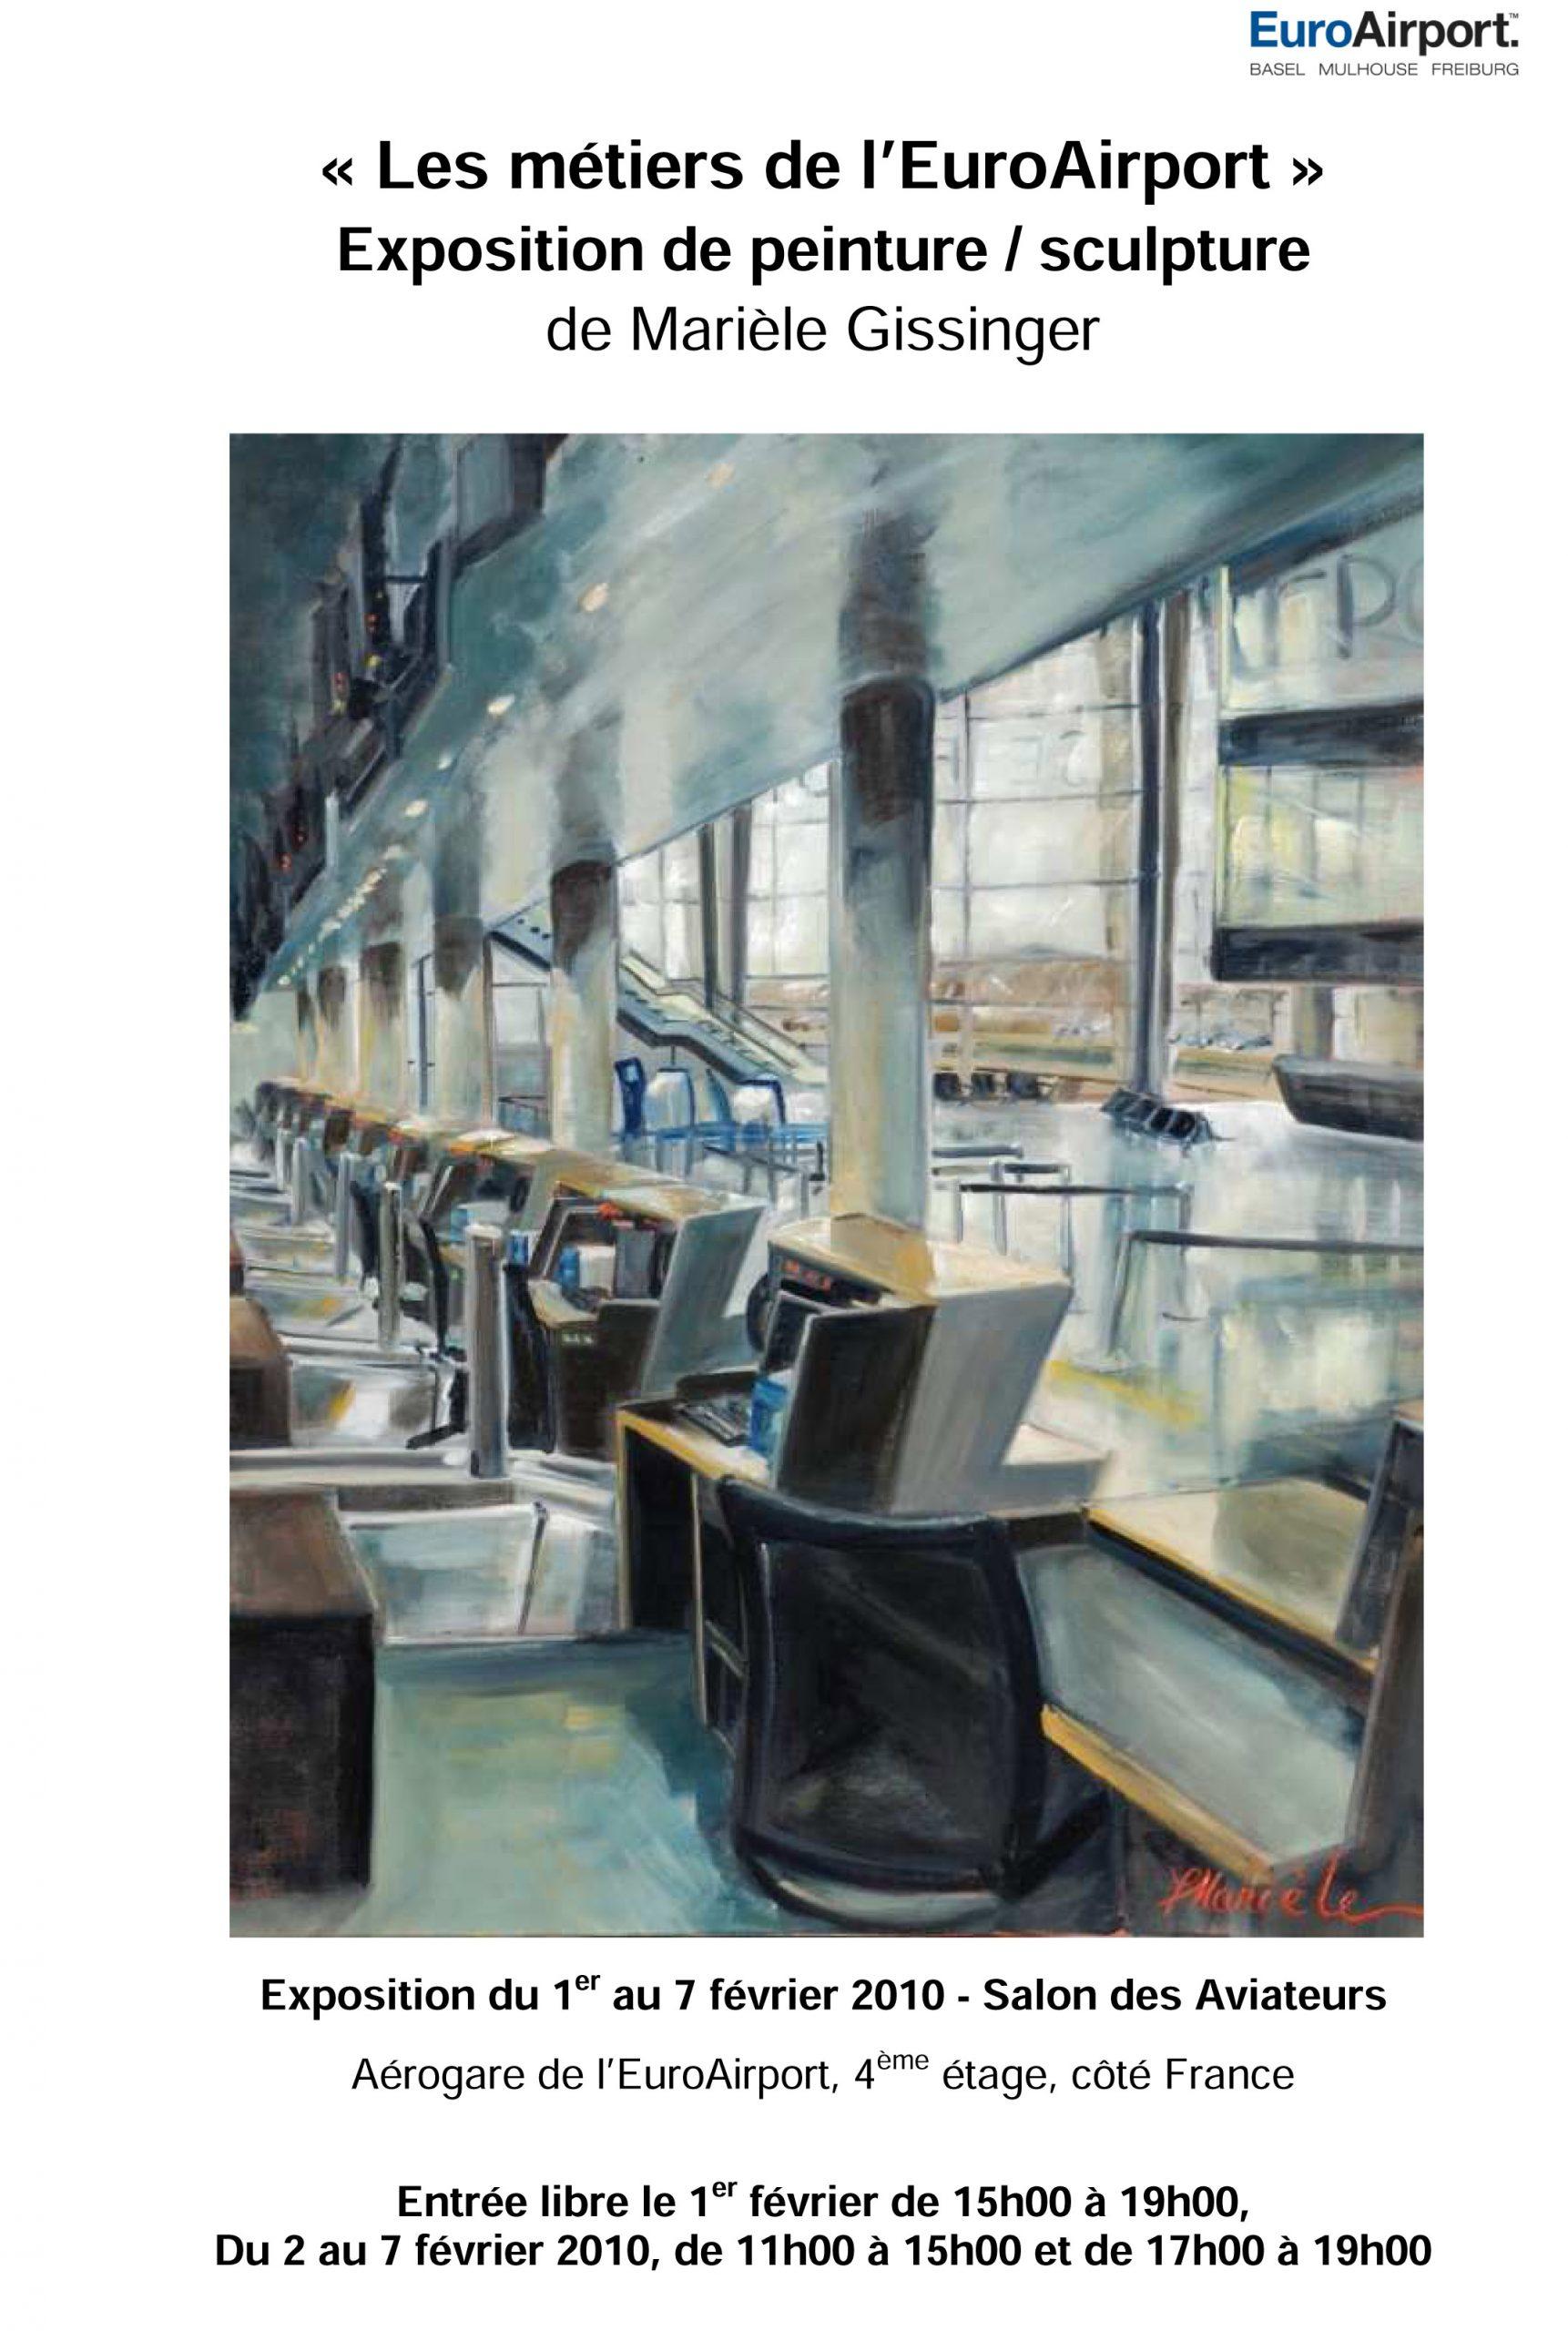 Gissinger-Mariele-Peinture-huile-Peinte-Artiste-Art-gm-Alsace-France– EuroAiport-Basel – Bâle – Freibourg - Mulhouse